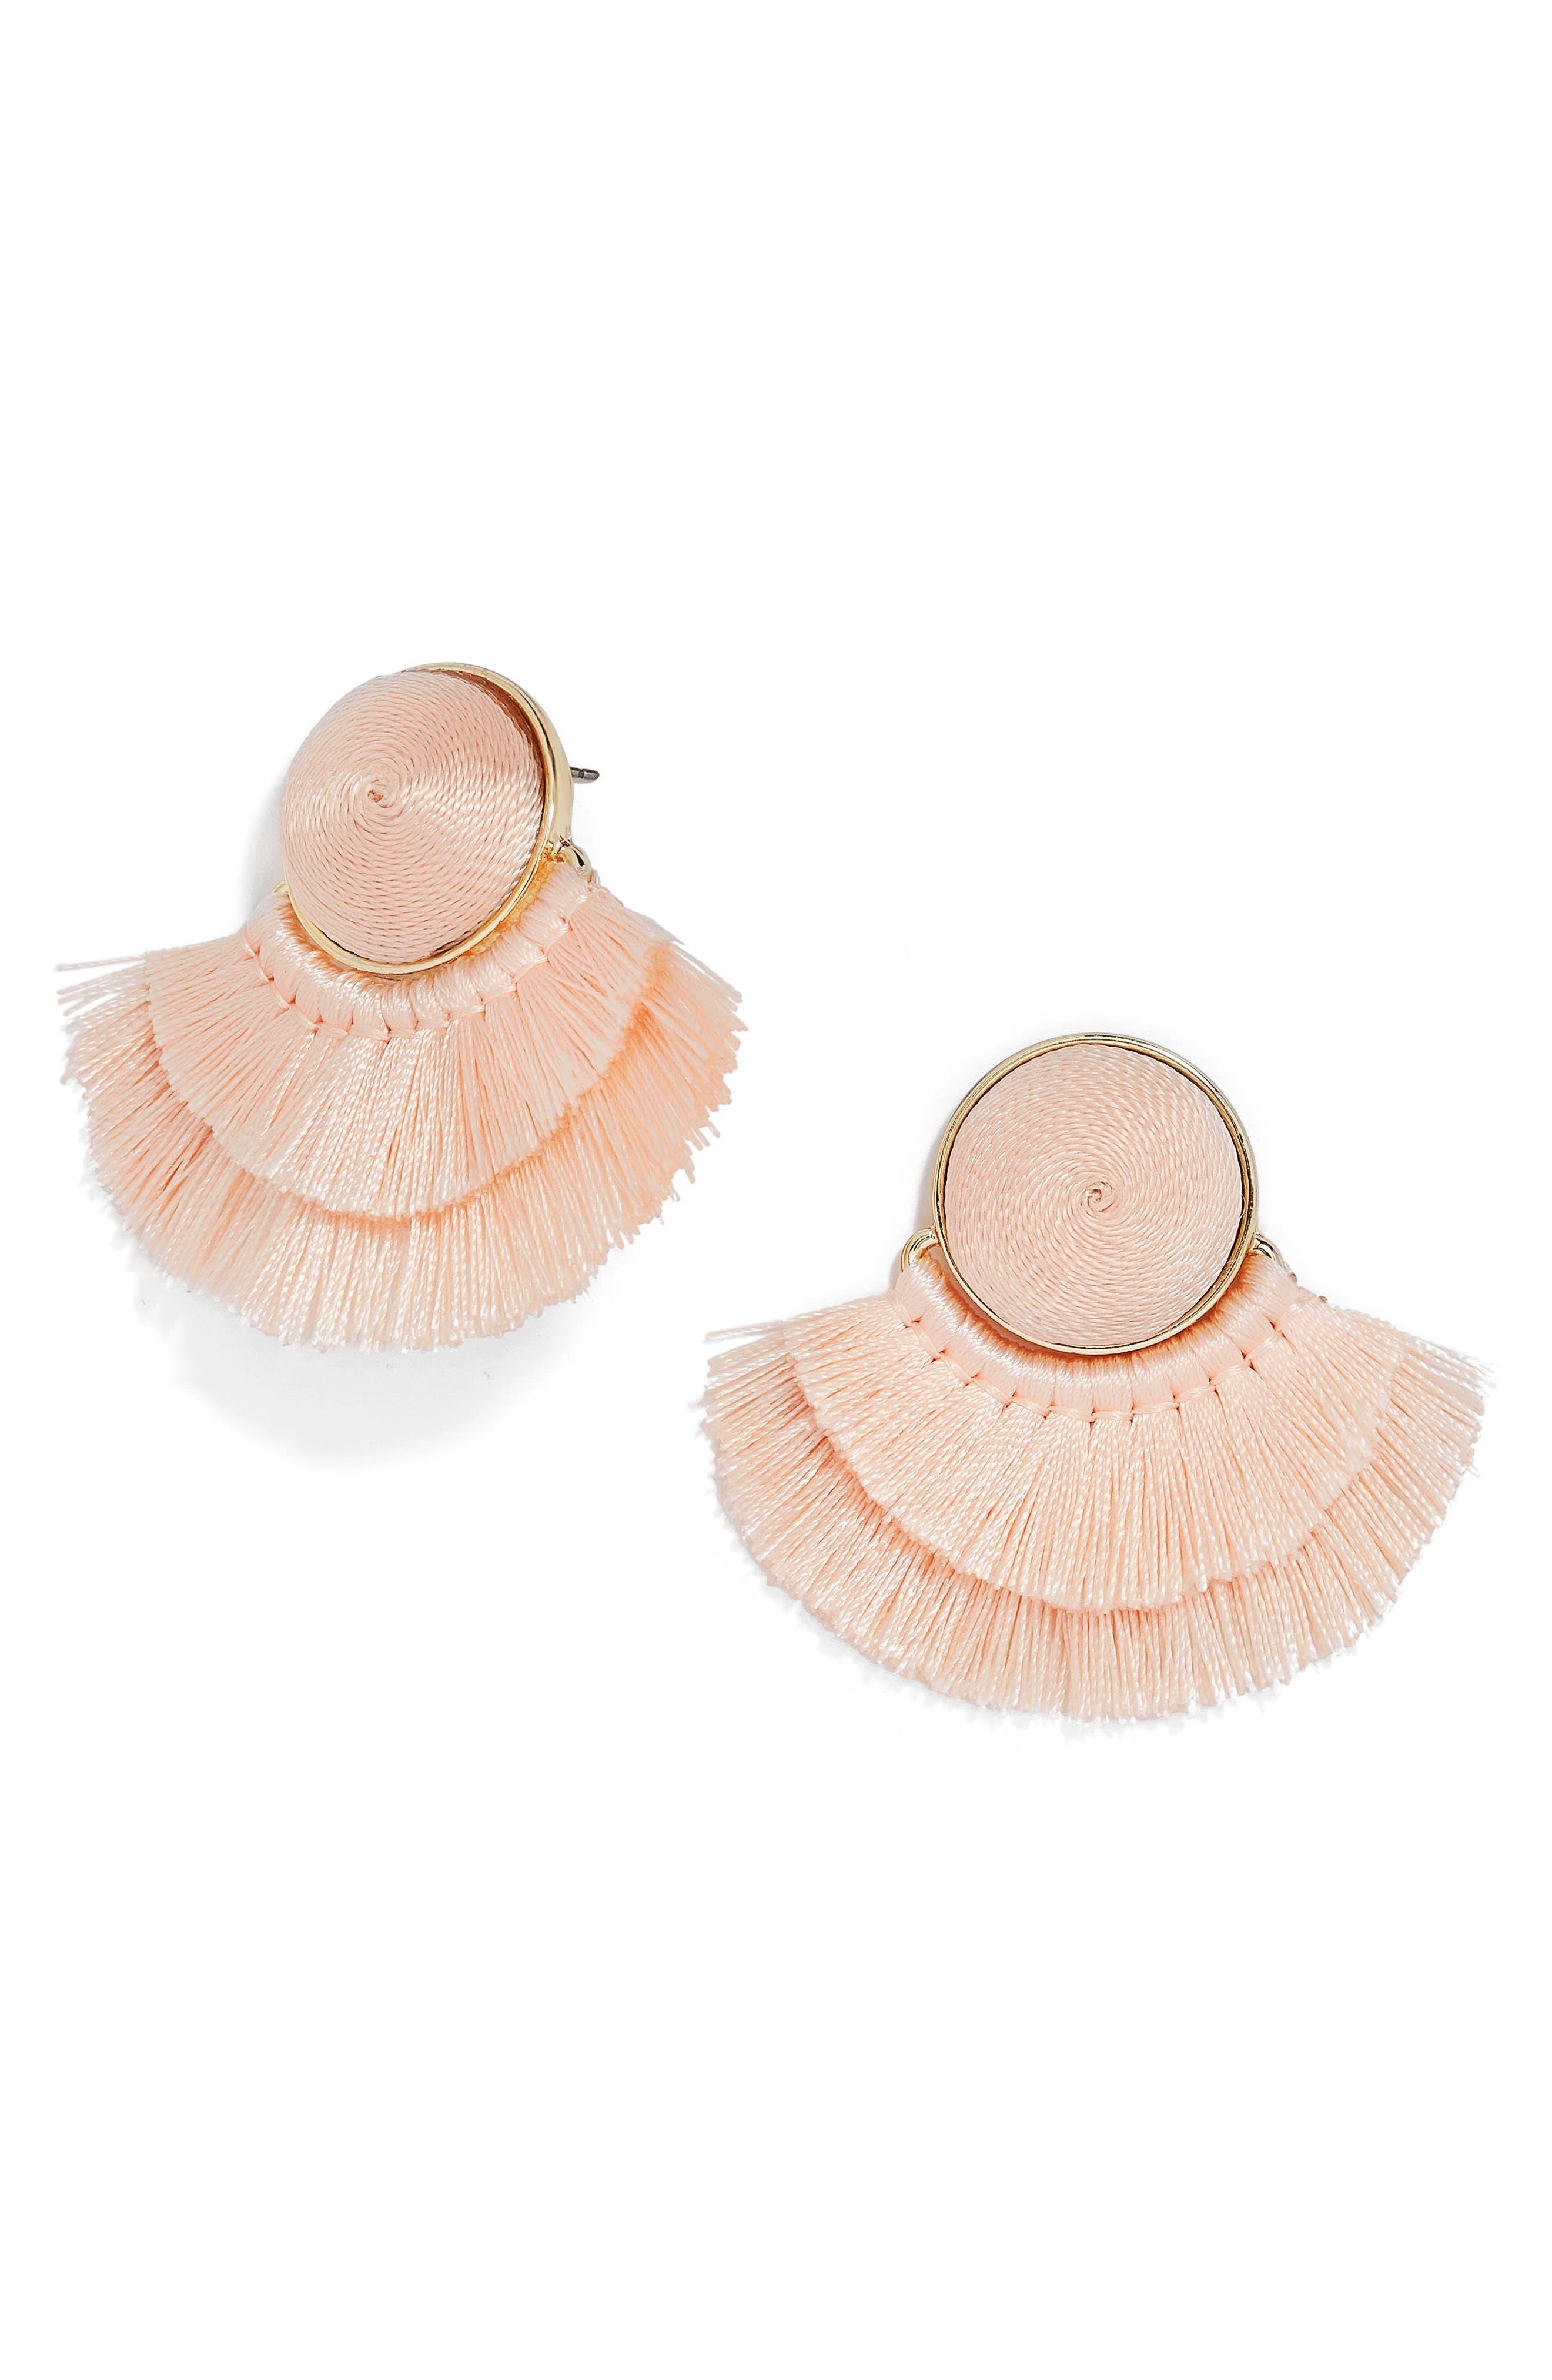 Martina Chubby Deco Fringe Drop Earrings,                             Main thumbnail 2, color,